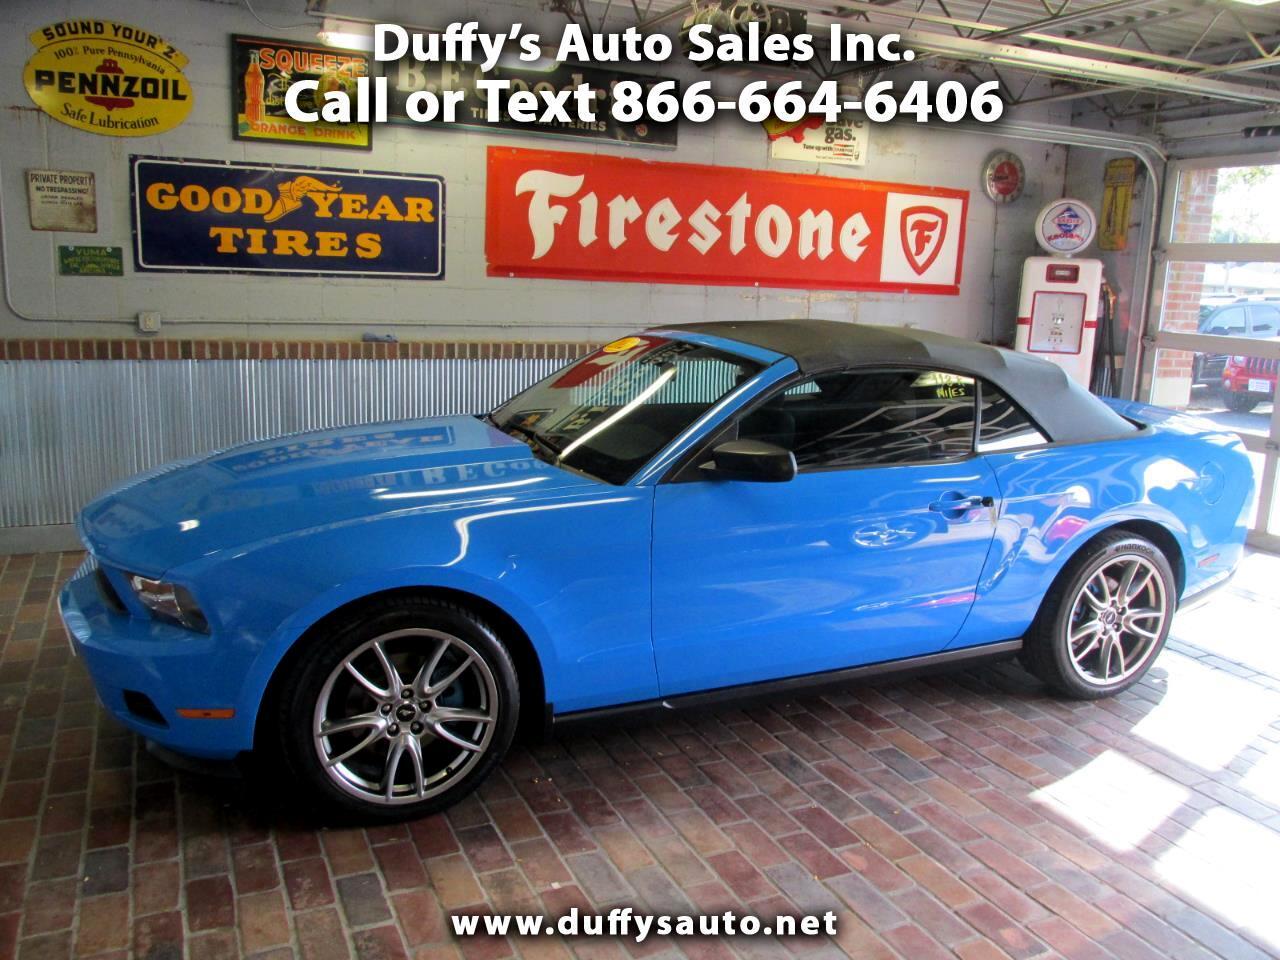 Ford Mustang 2dr Conv V6 2012